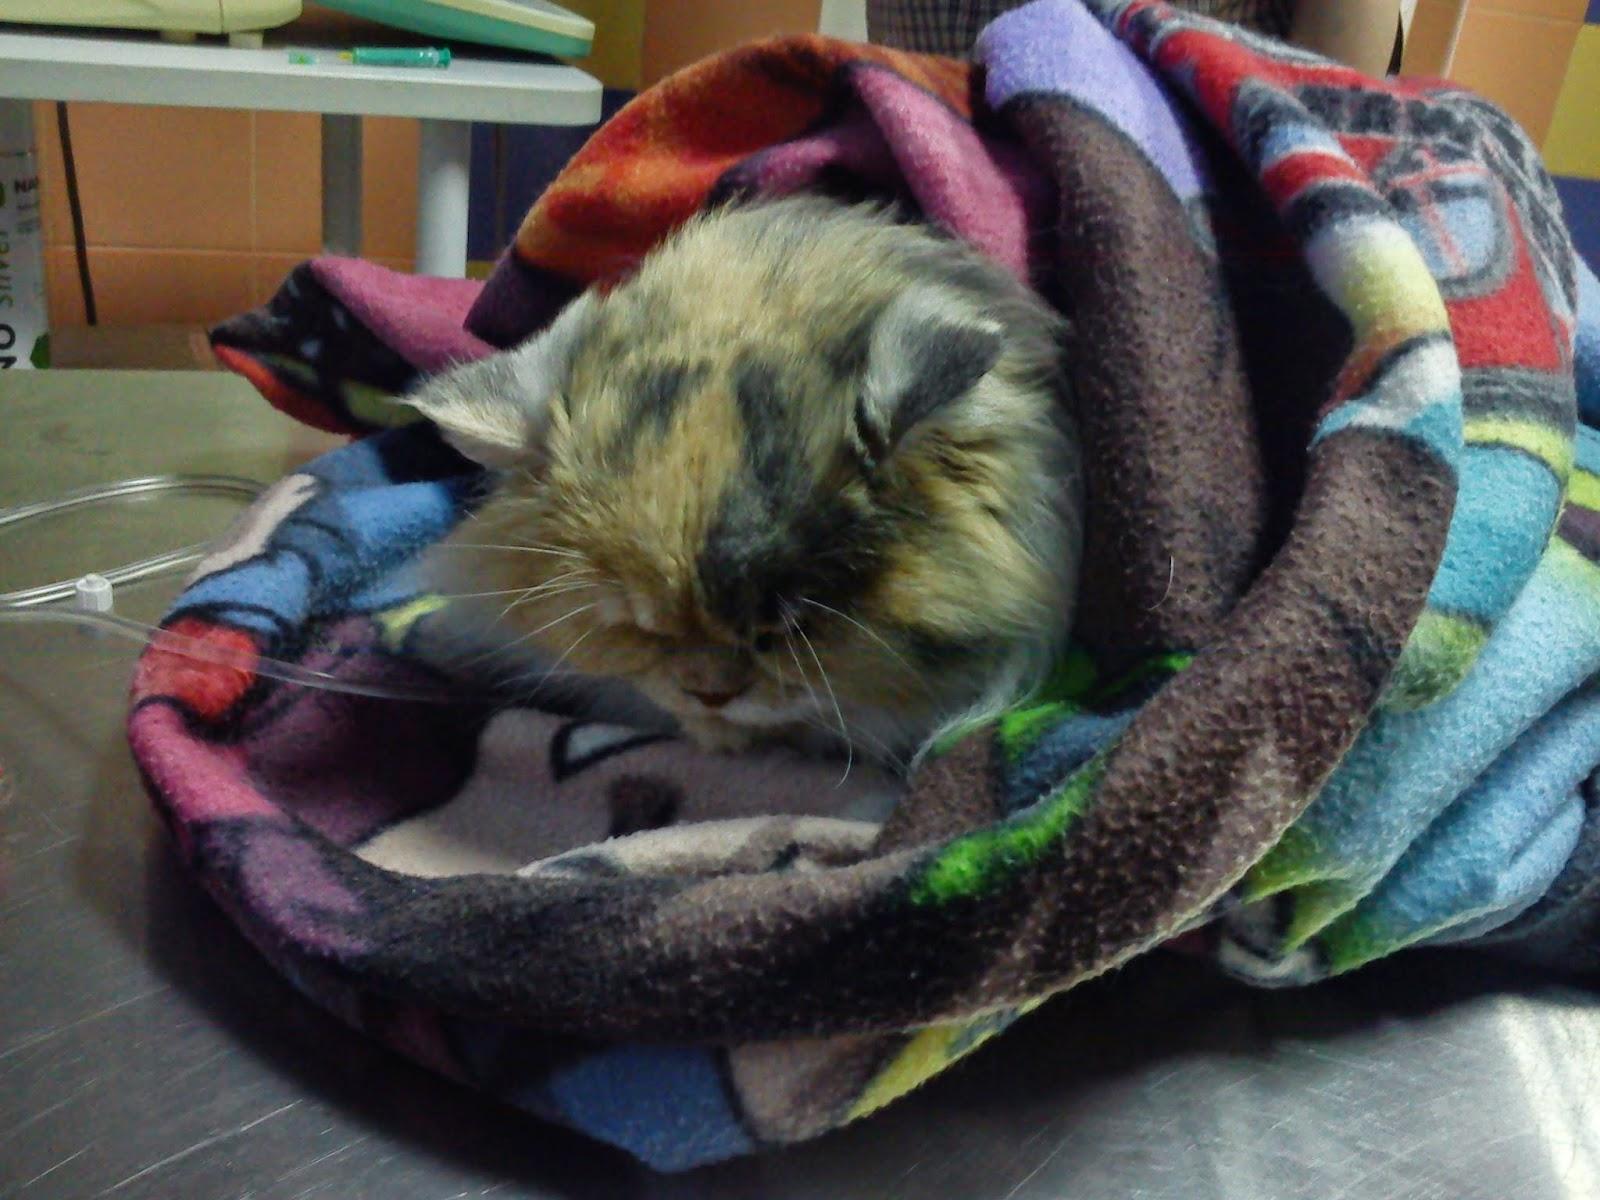 ropomacicze u kotki, sterylizacja kota